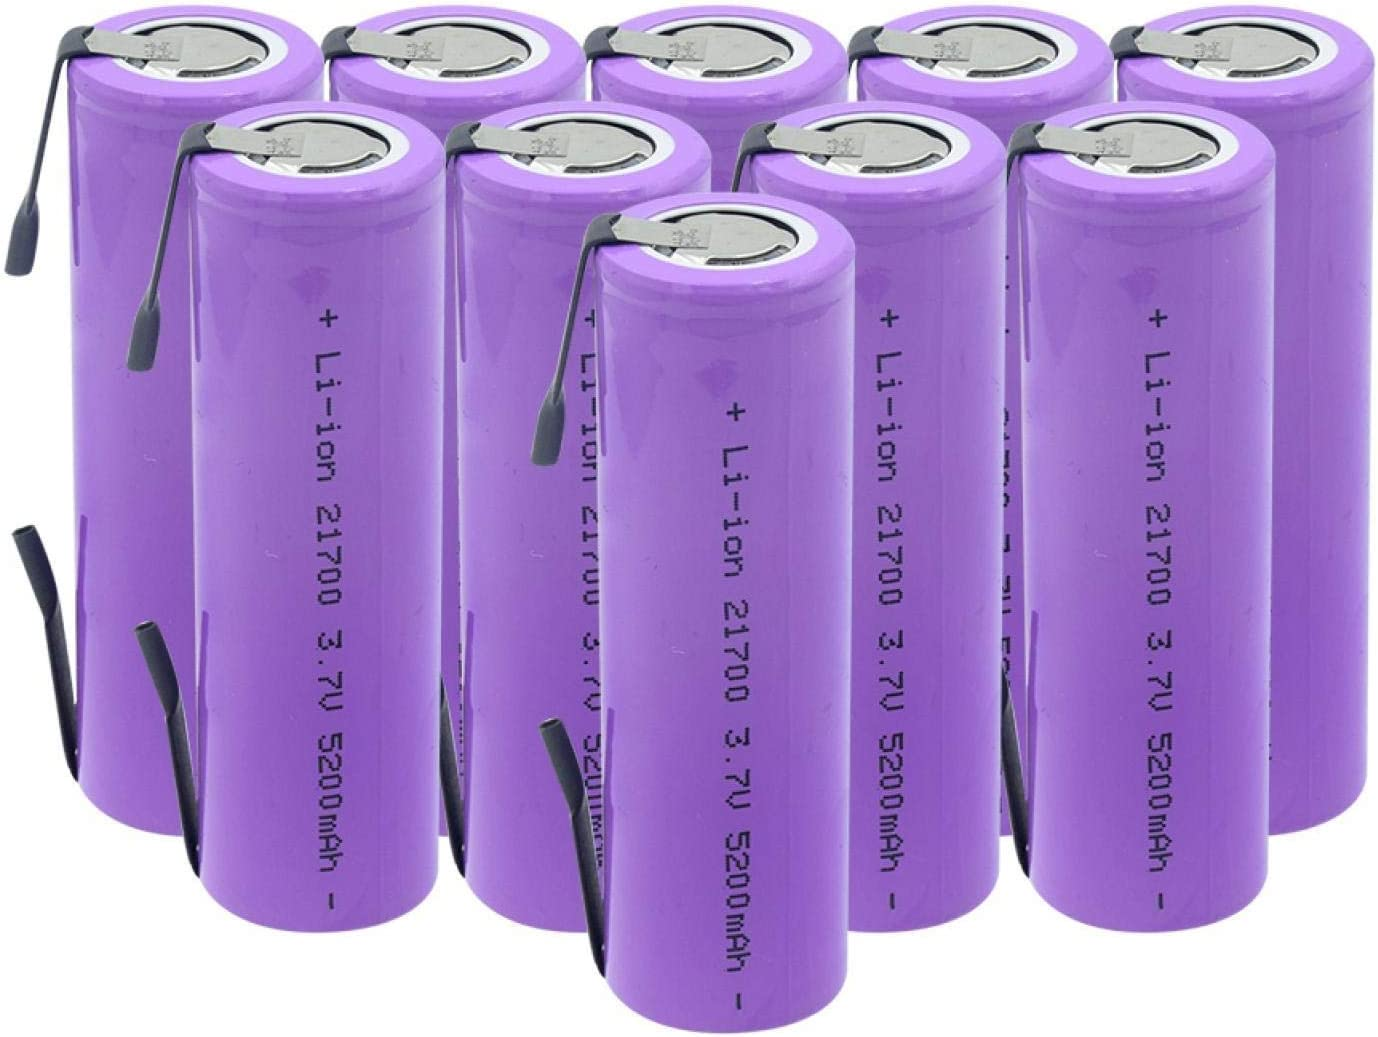 RECORDARME Rechargeable 21700 Lithium Battery High Drain 20a 3.7v 5200mah+ Diy Nicke, for Flashlight Headlamp Power Bank Toy 4PCS 4PCS